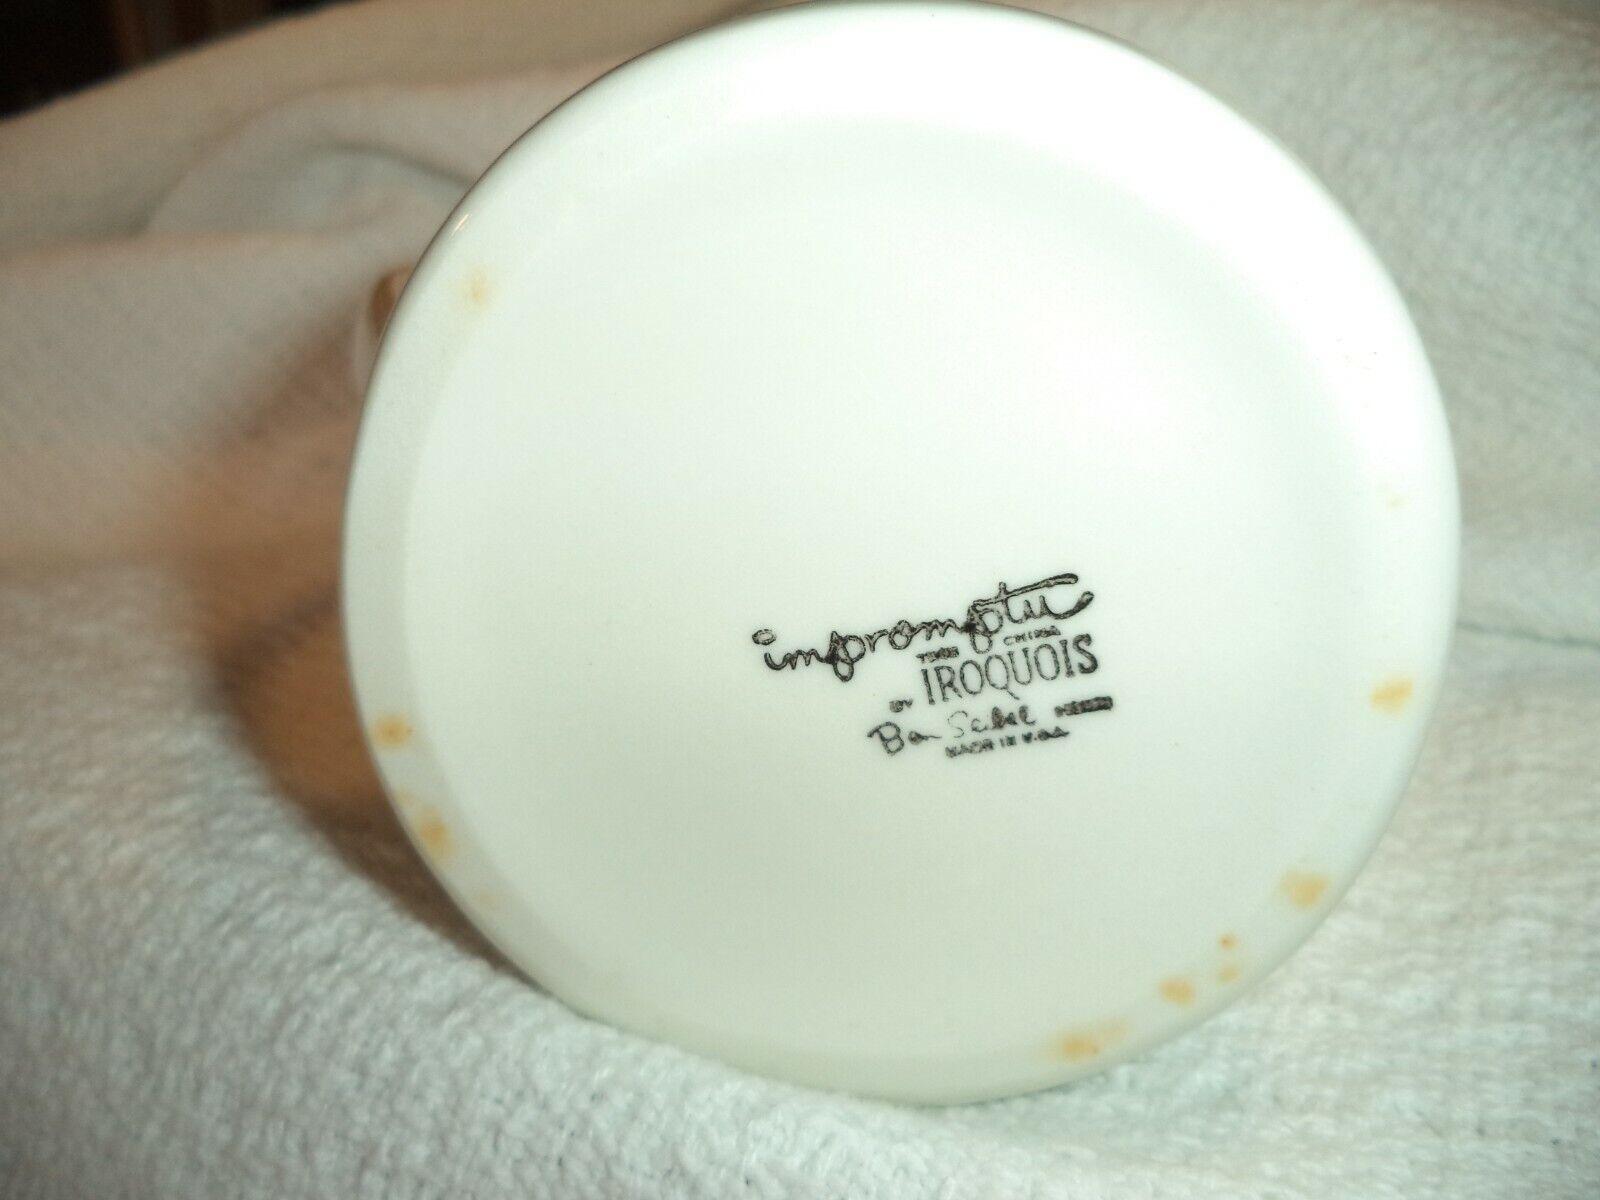 Vintage Iroquois China Impromptu Ben Seibel Grape Leaves Creamer Pitcher - $8.95